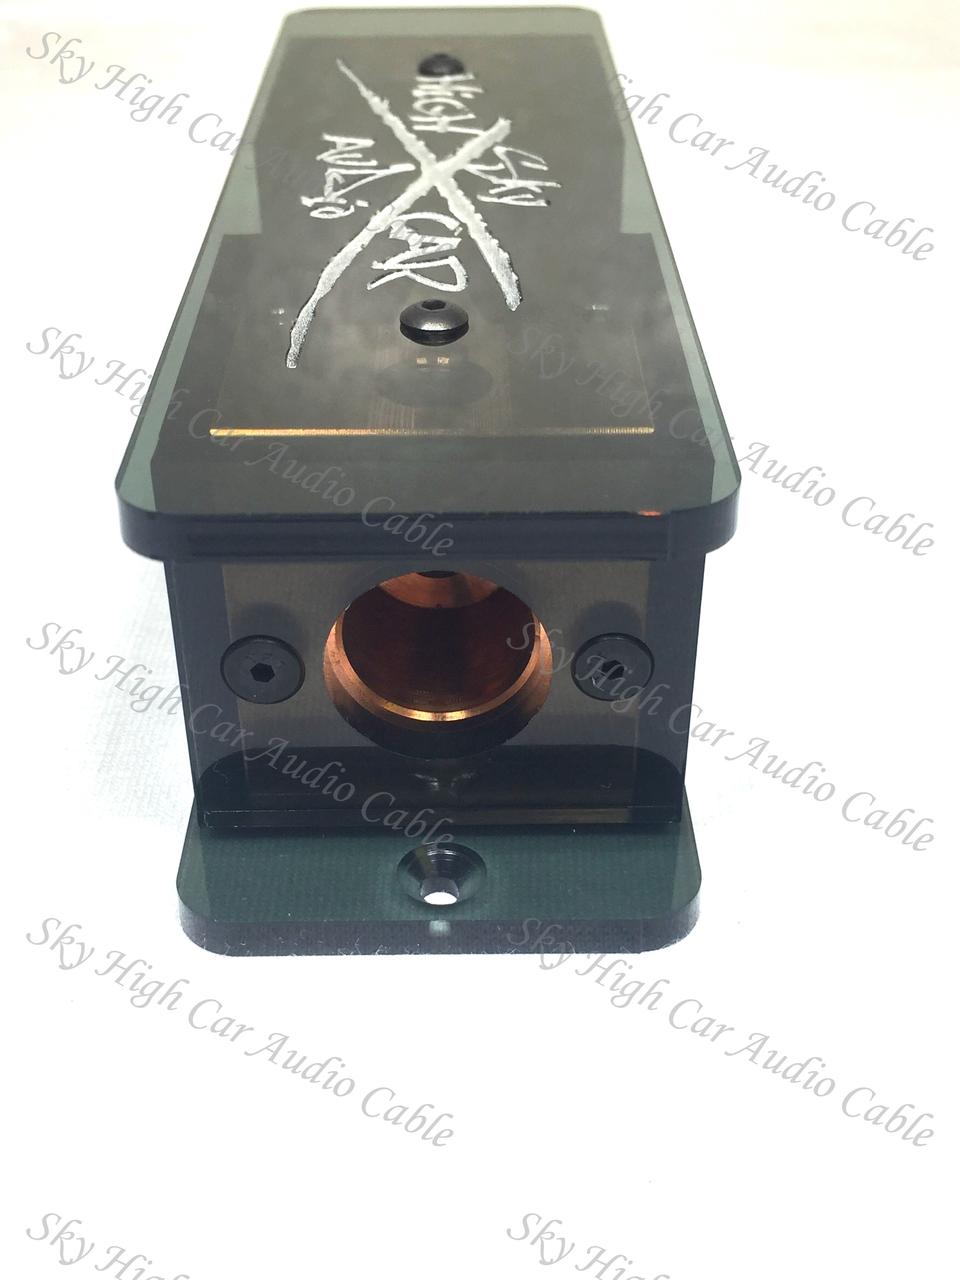 sky high car audio copper 2 0 anl fuse holder set screw [ 960 x 1280 Pixel ]